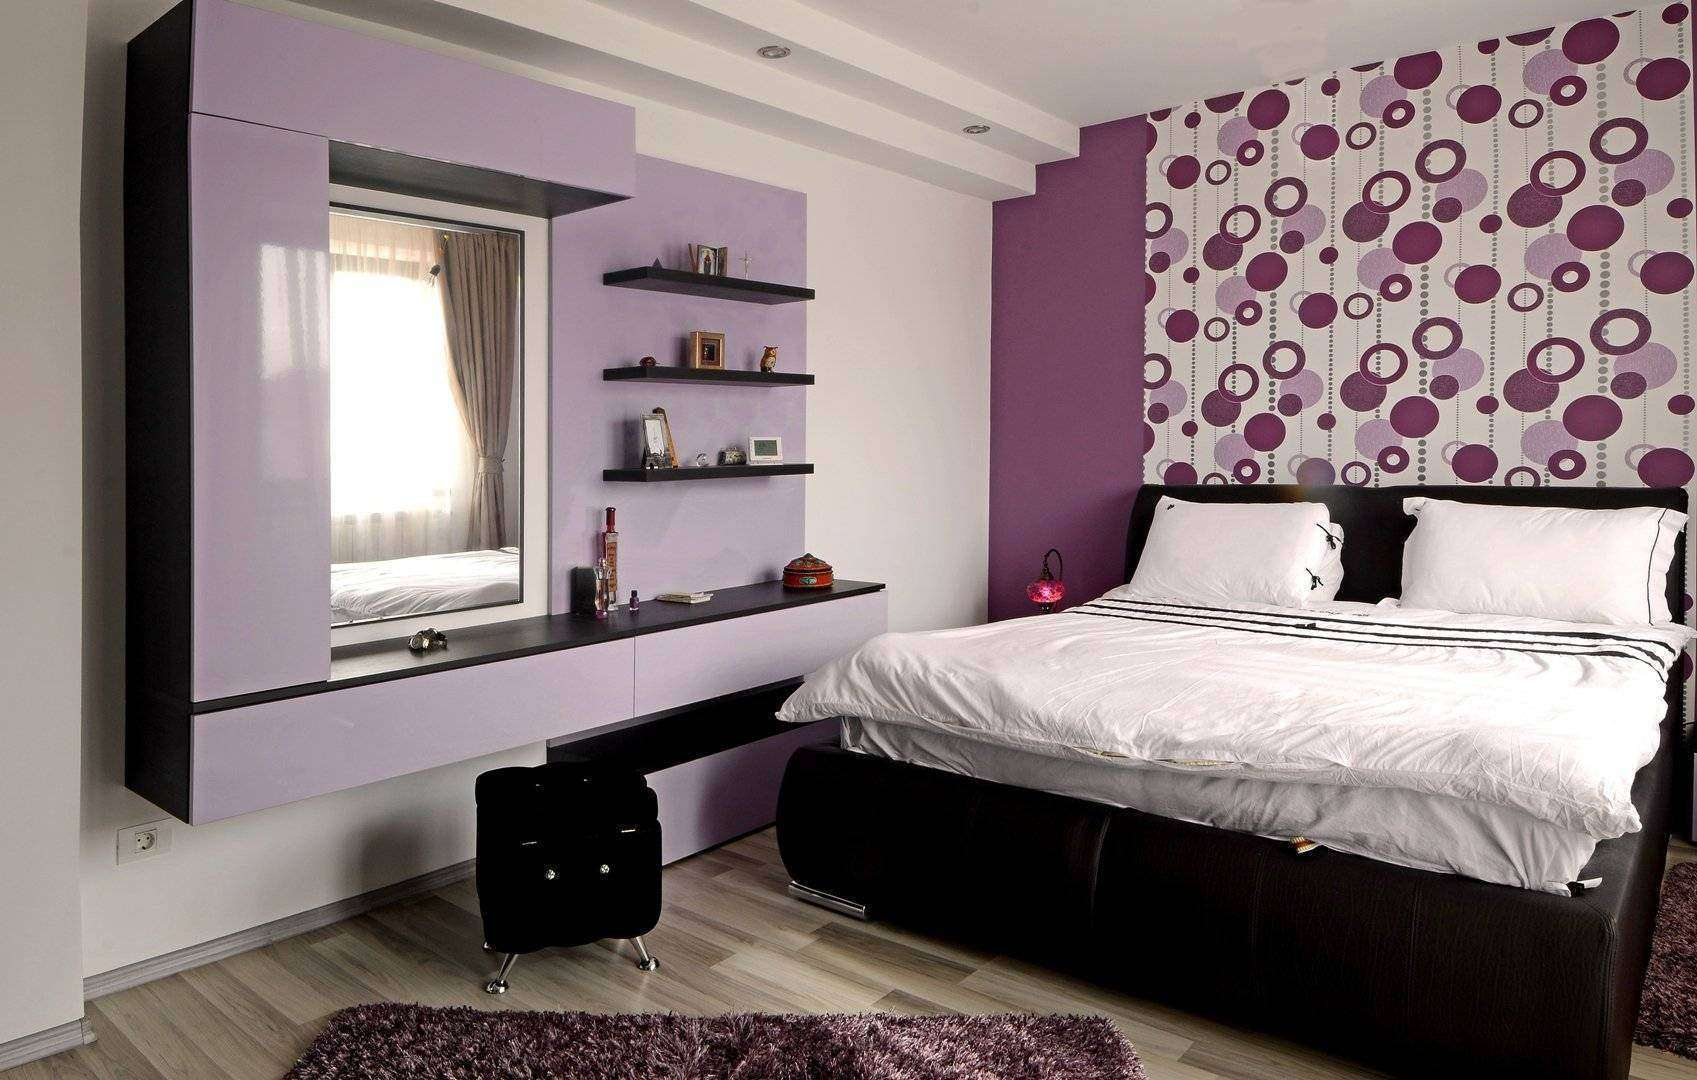 "<a href=""mobila dormitor la comanda moderna "">dormitor matrimonial Ramona la comanda <img src='https://www.unican.ro/wp-content/themes/vita/img/dreapta.png' class='pull-right hidden-xs' style='margin-right:-10px;margin-top:-10px; max-height:41px'></a>"